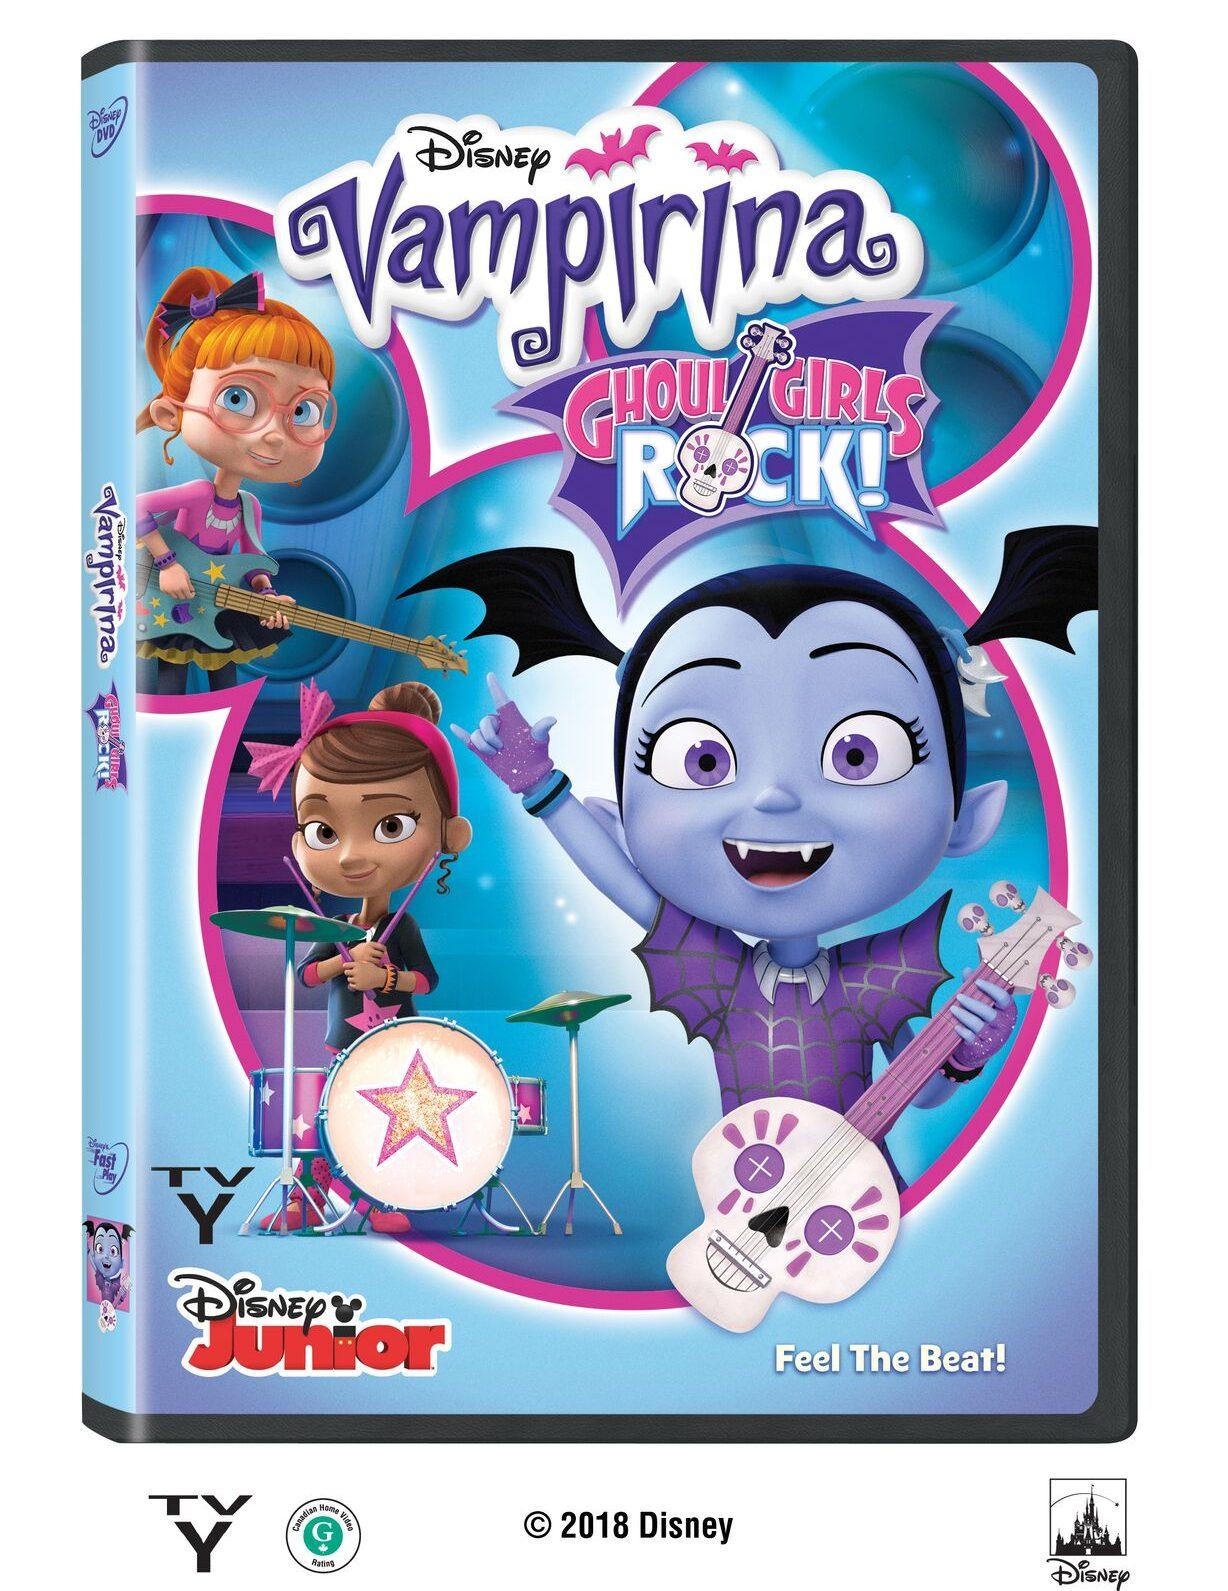 Vampirina: Ghoul Girls Rock DVD #Vampirina #DVD #movies #ad